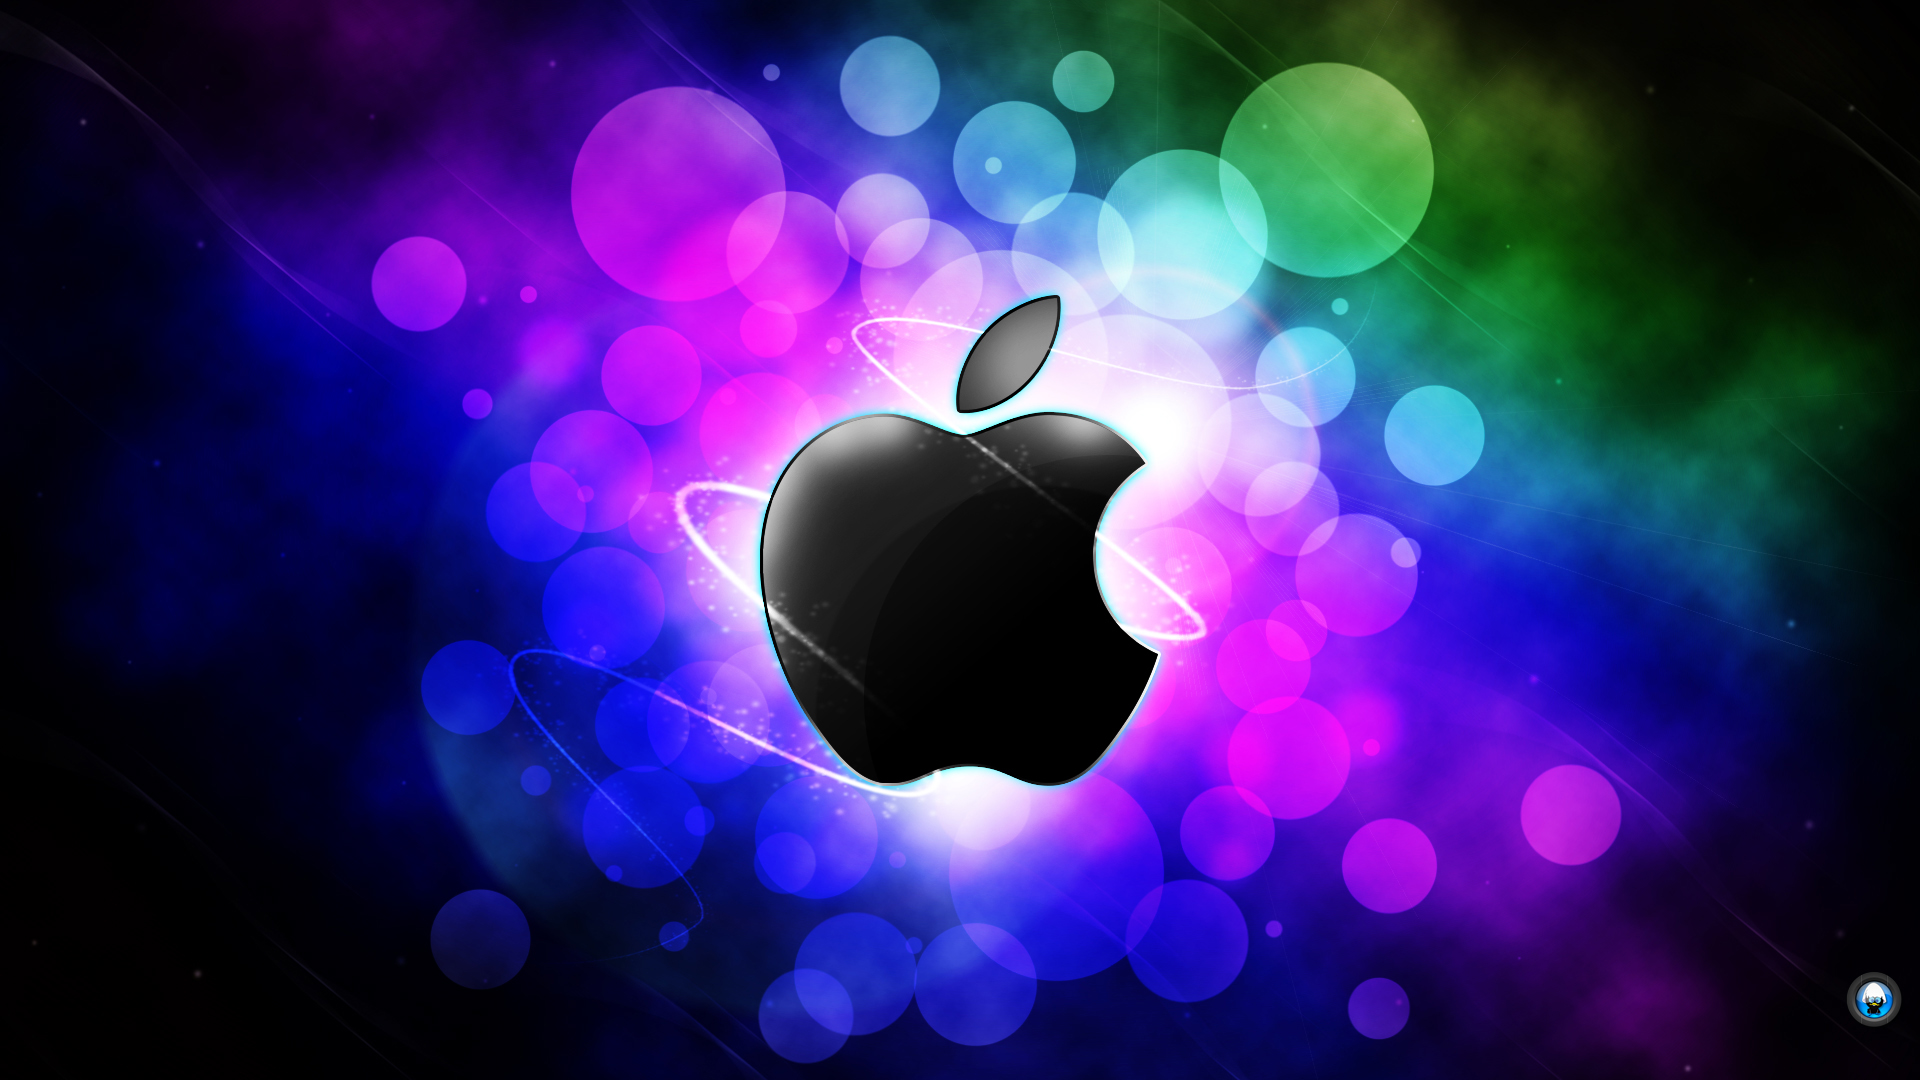 cool apple logo wallpaper #6